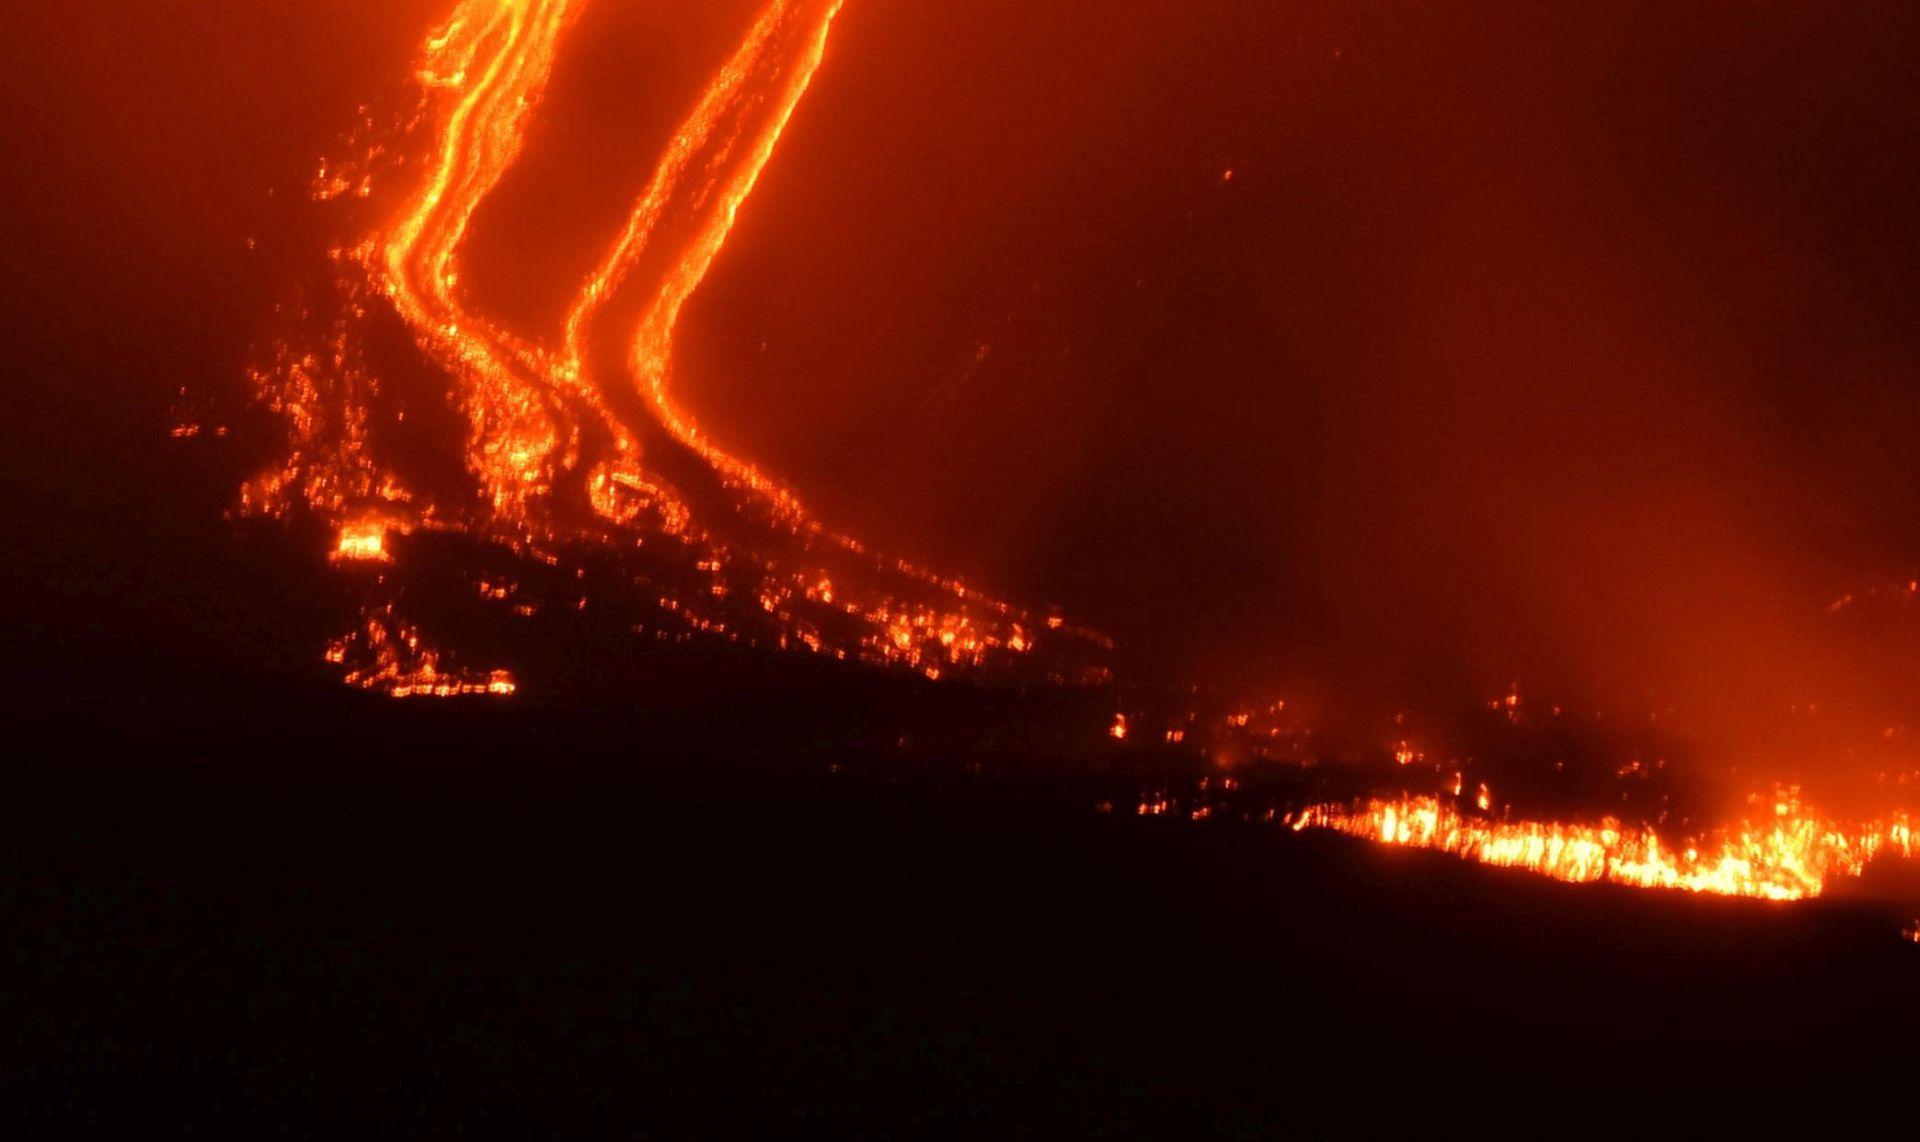 Pet mrtvih u erupciji vulkana na Novom Zelandu